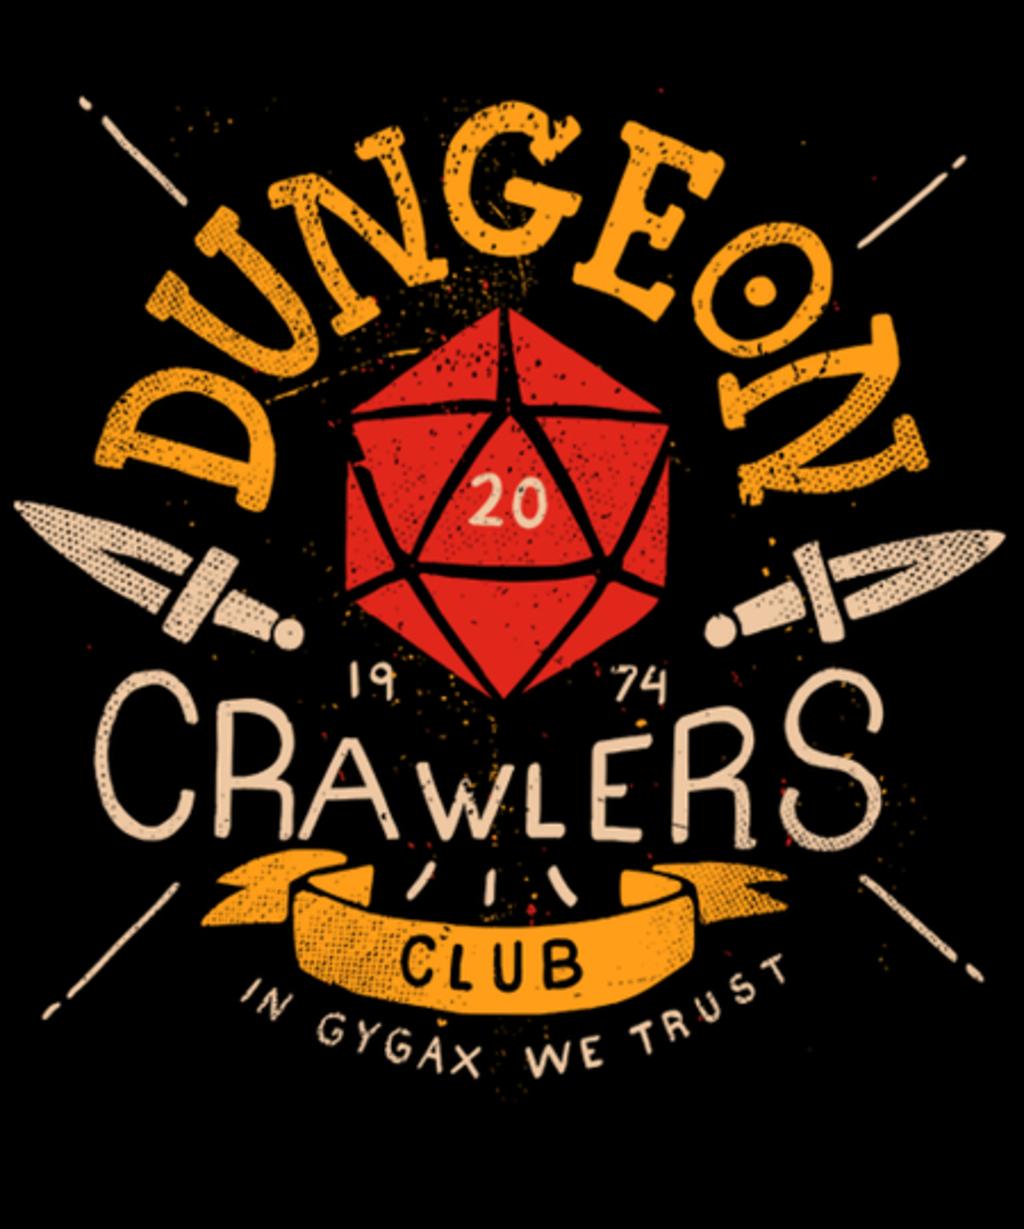 Qwertee: Dungeon Crawlers Club